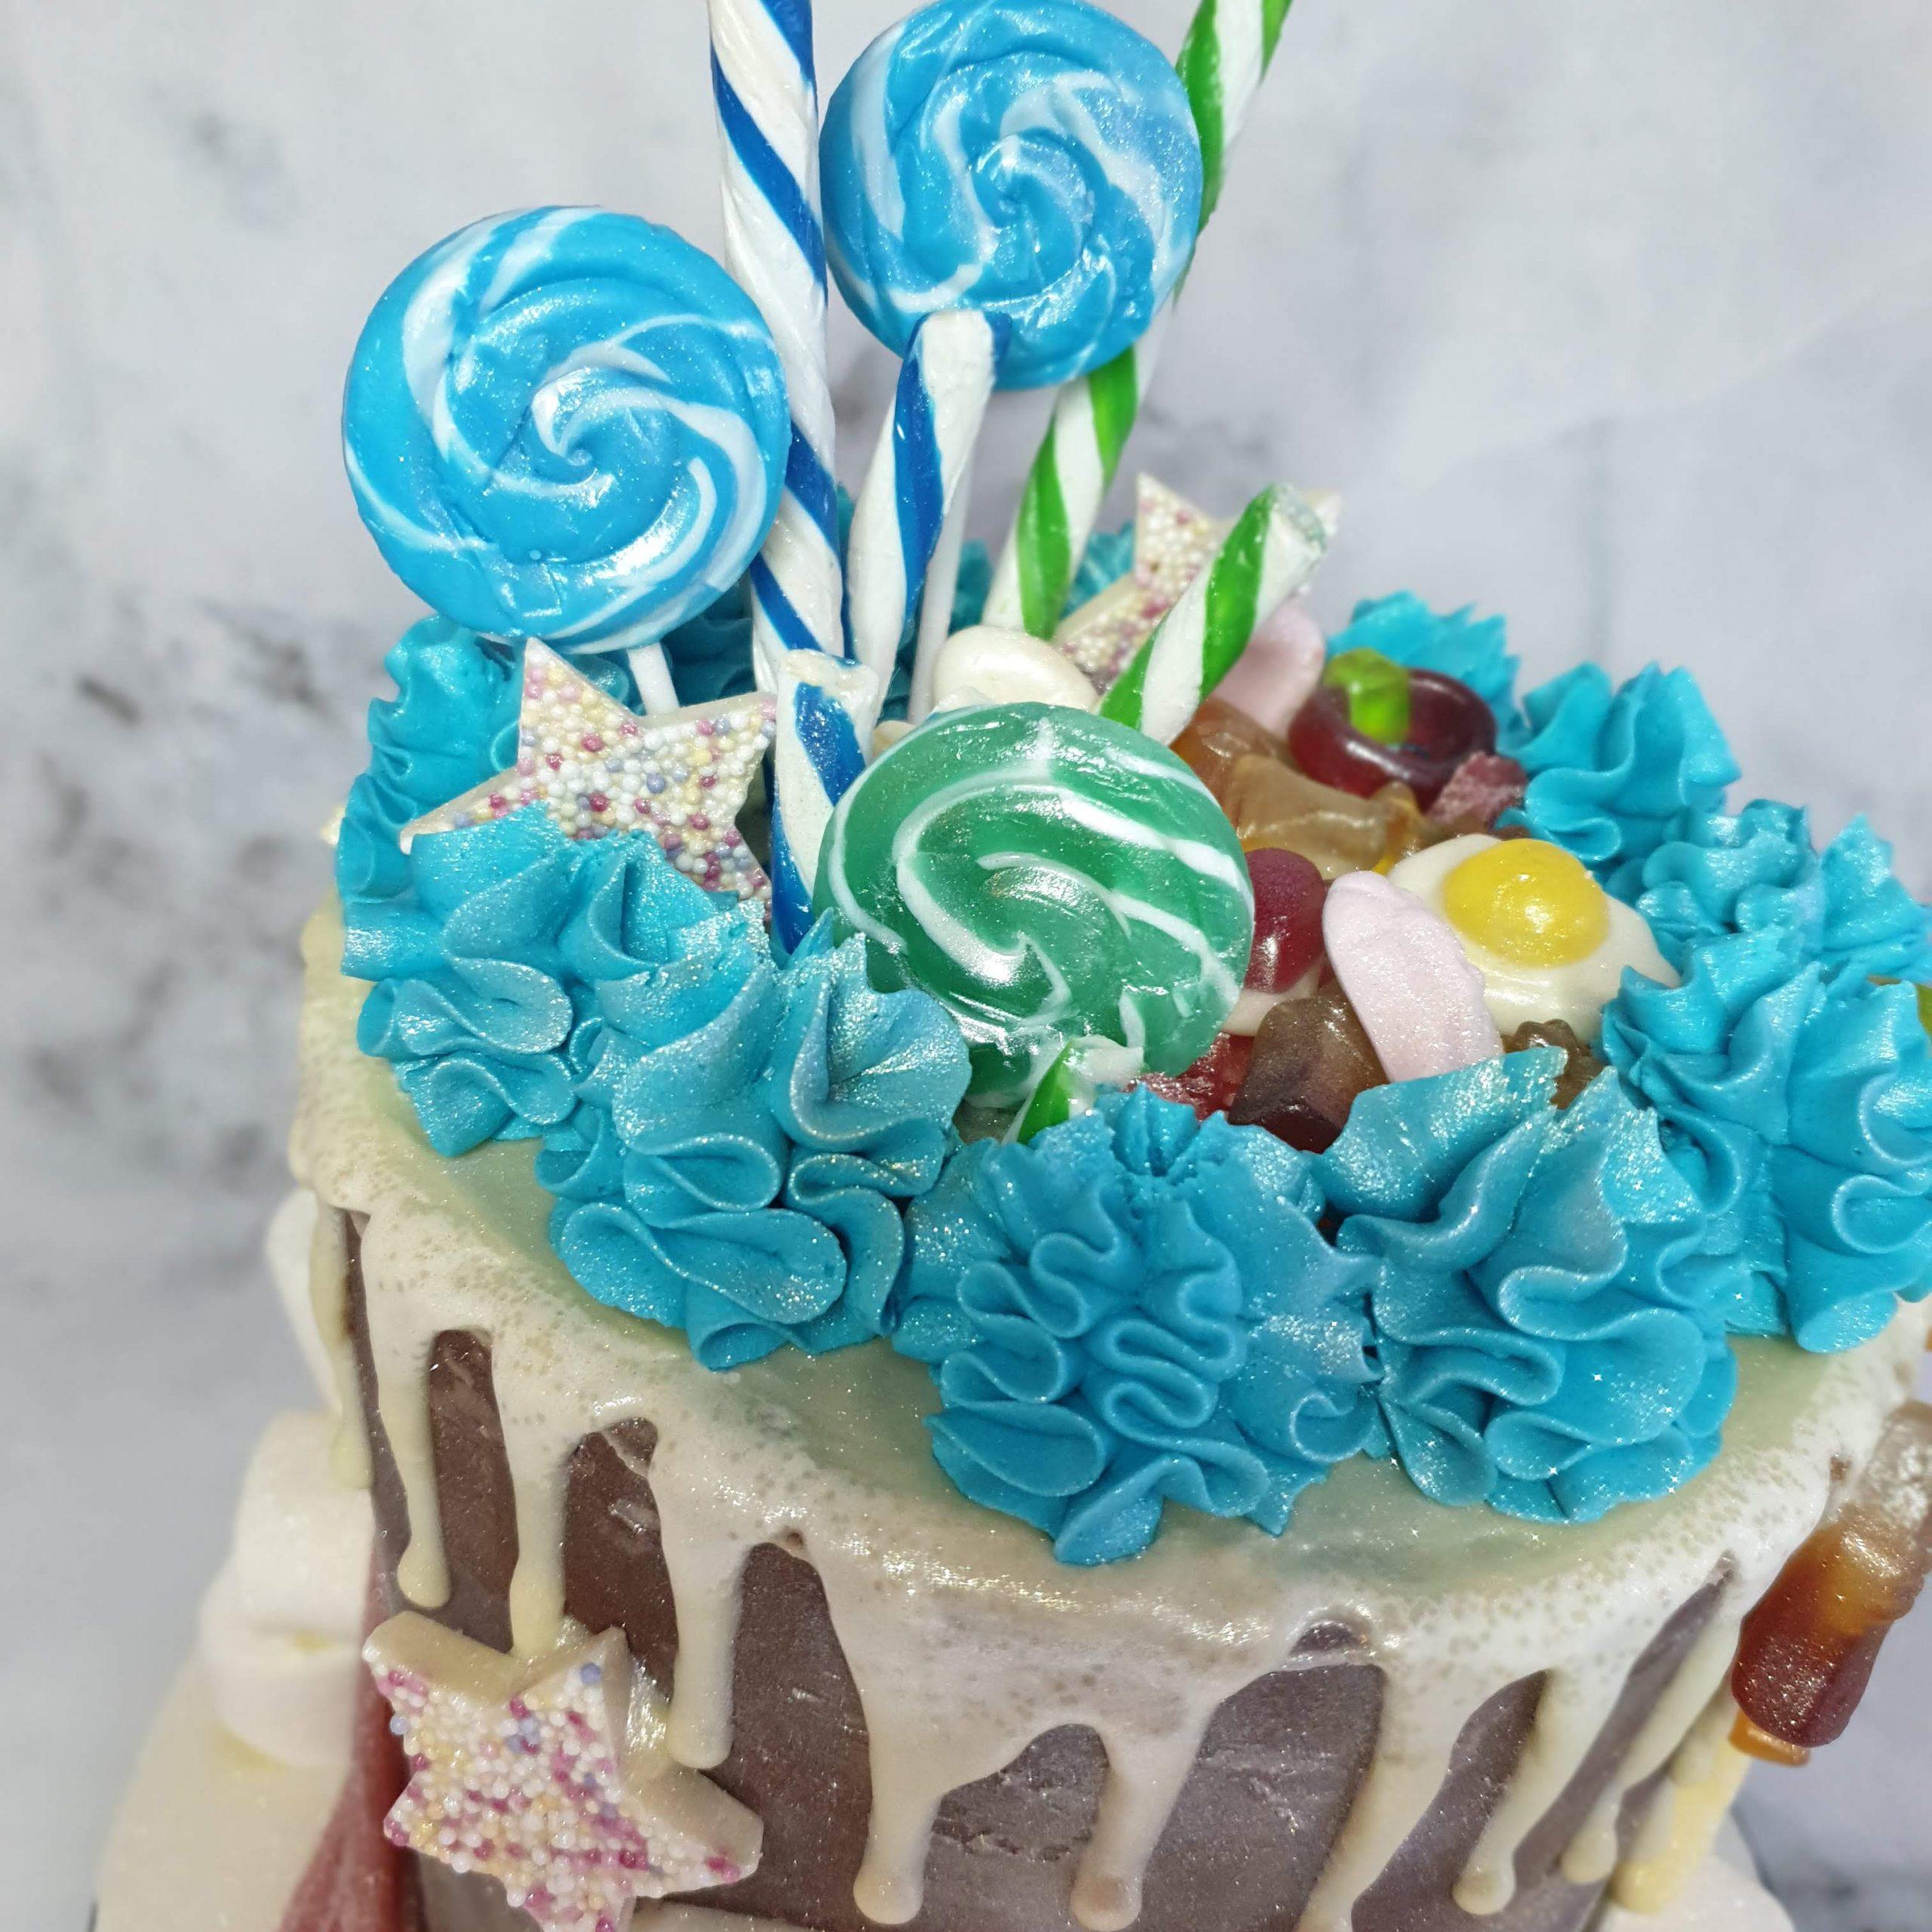 essex cake making celebrations essex cake shop